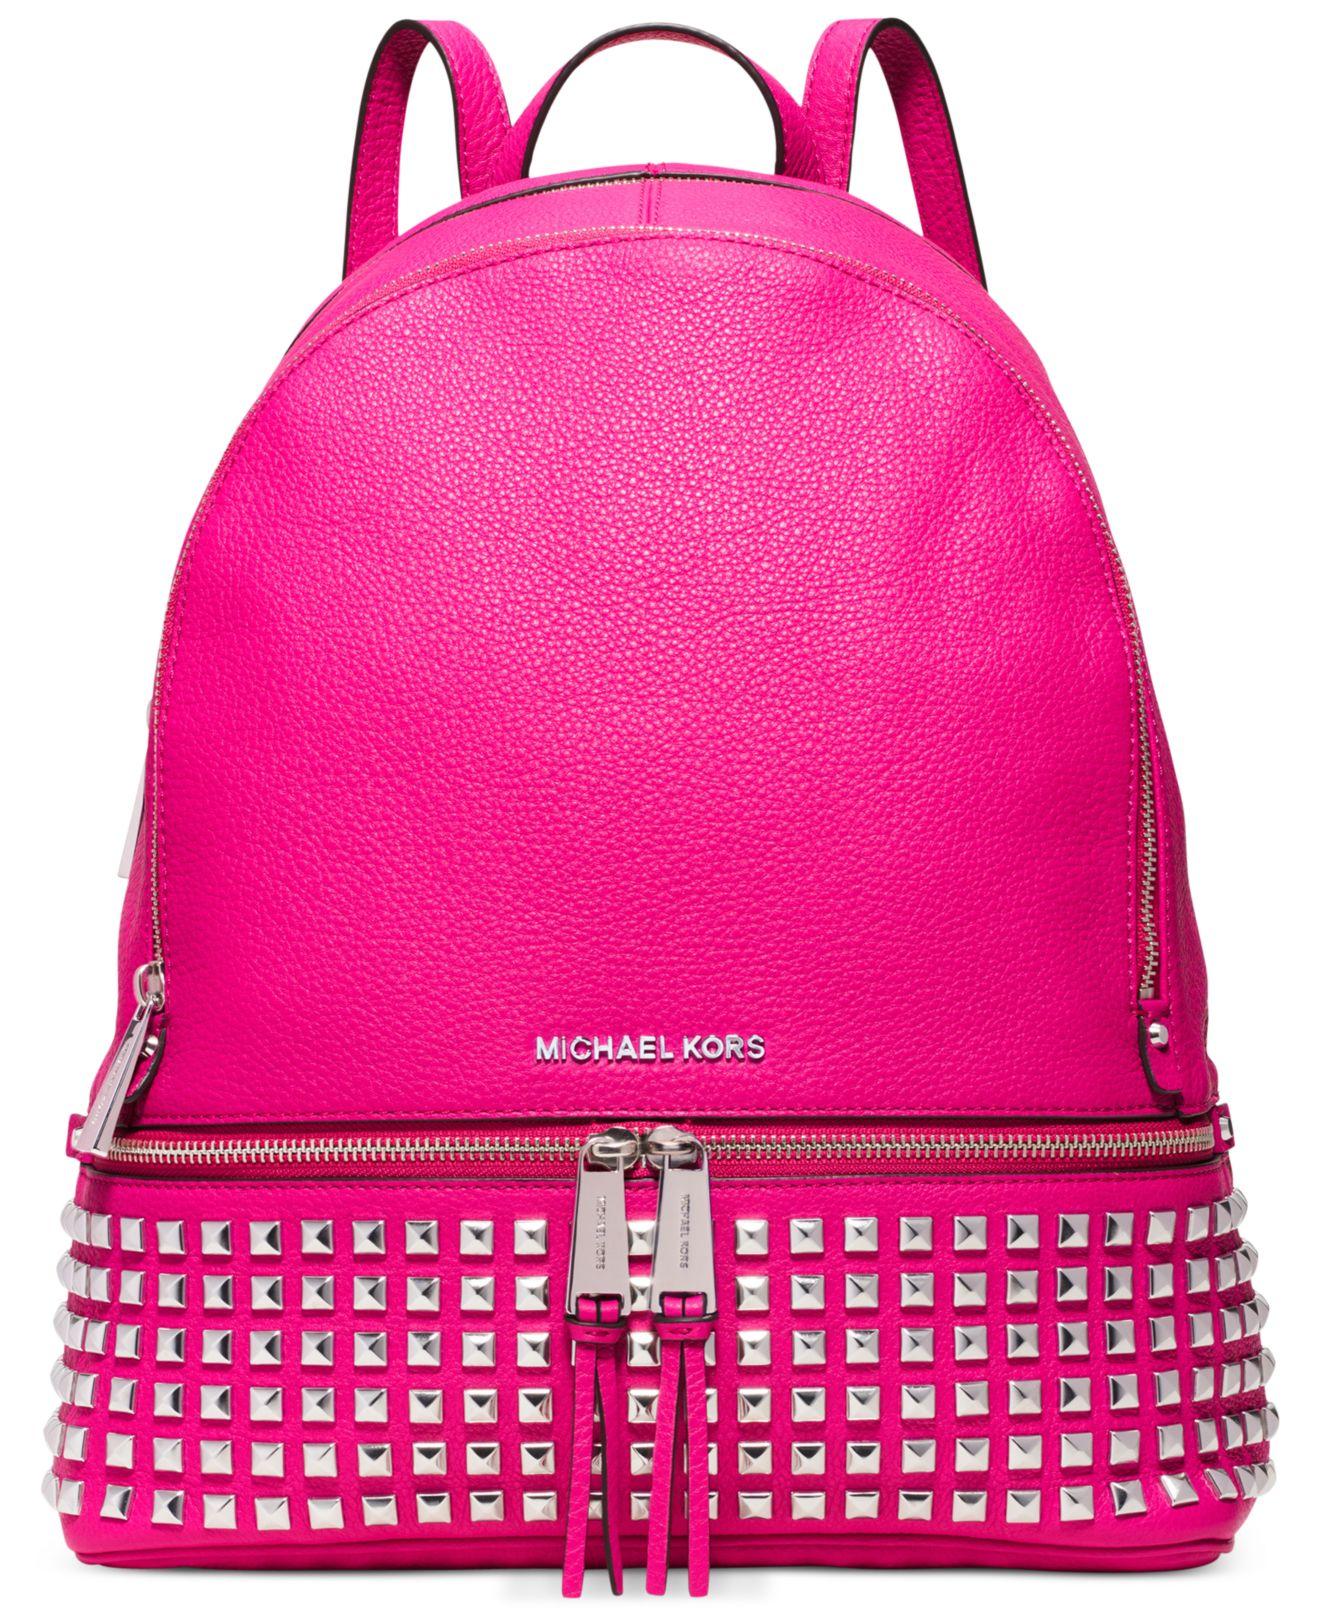 020c701b90c ... discount lyst michael kors michael rhea zip large studded backpack in  pink e218c 12fba